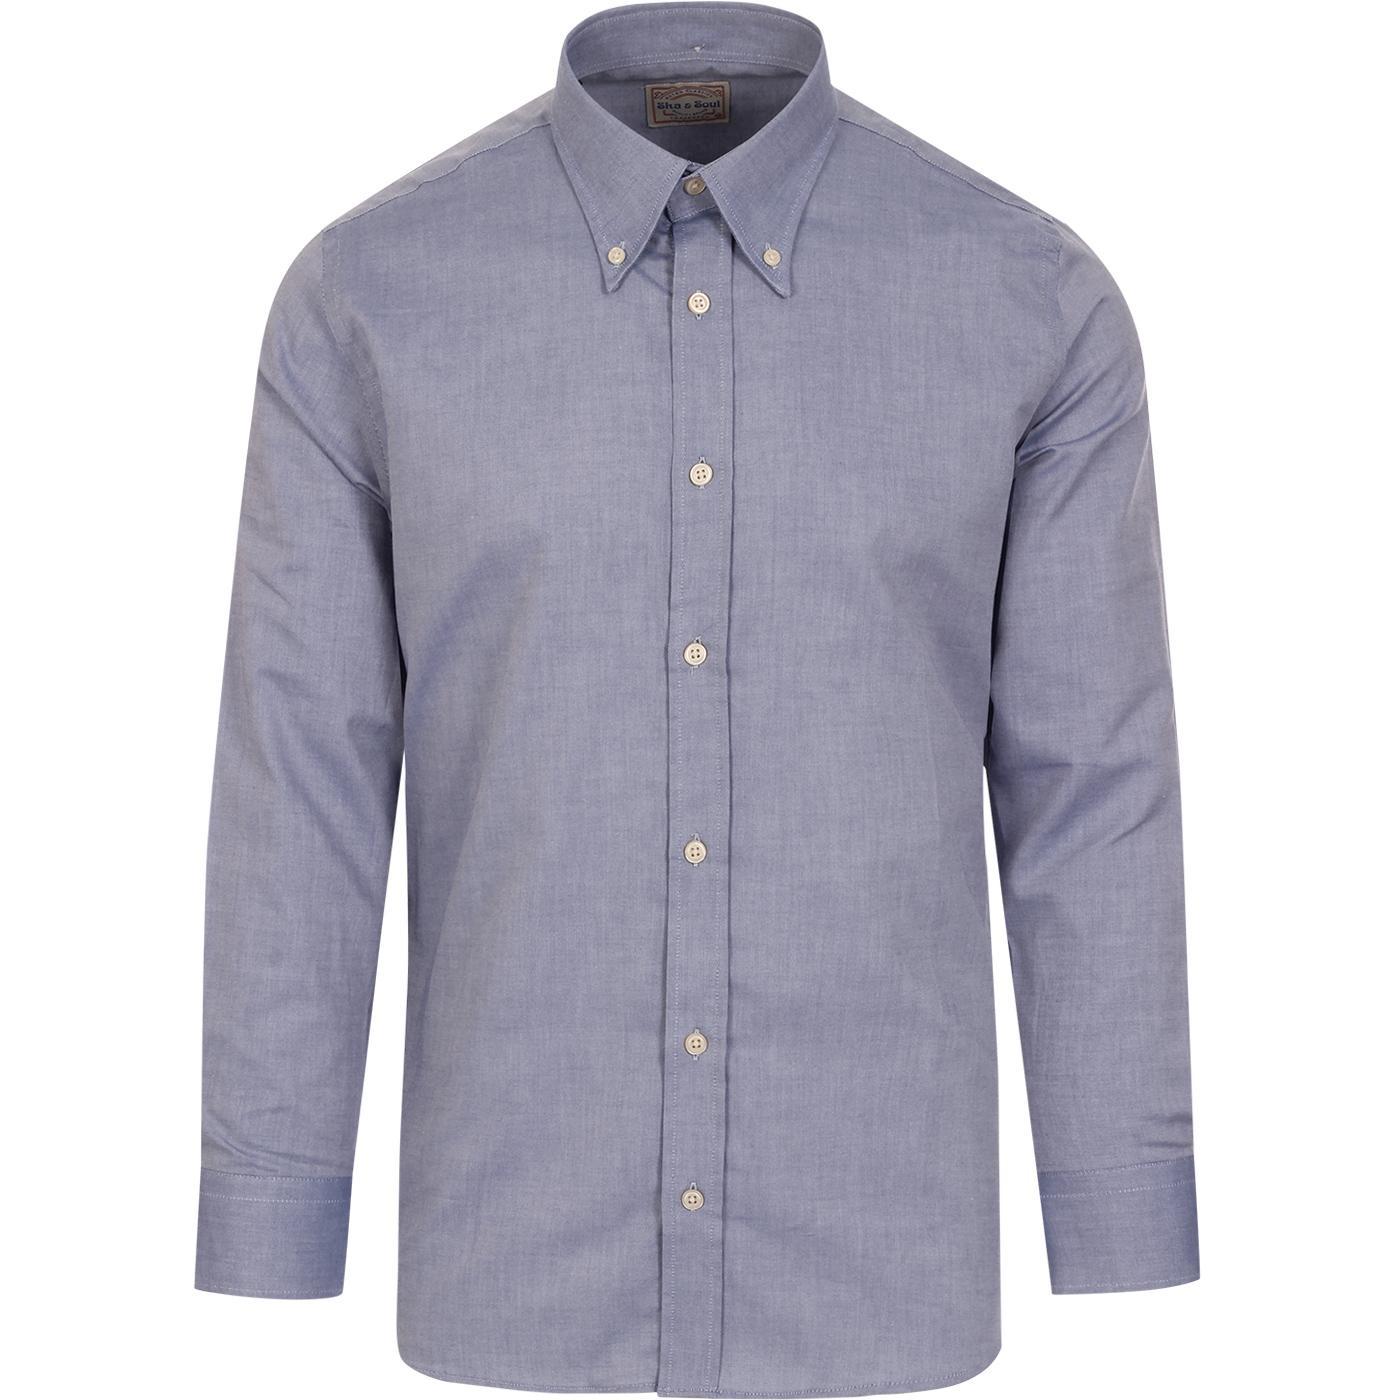 SKA & SOUL 60s Mod Spear Collar Oxford Shirt BLUE